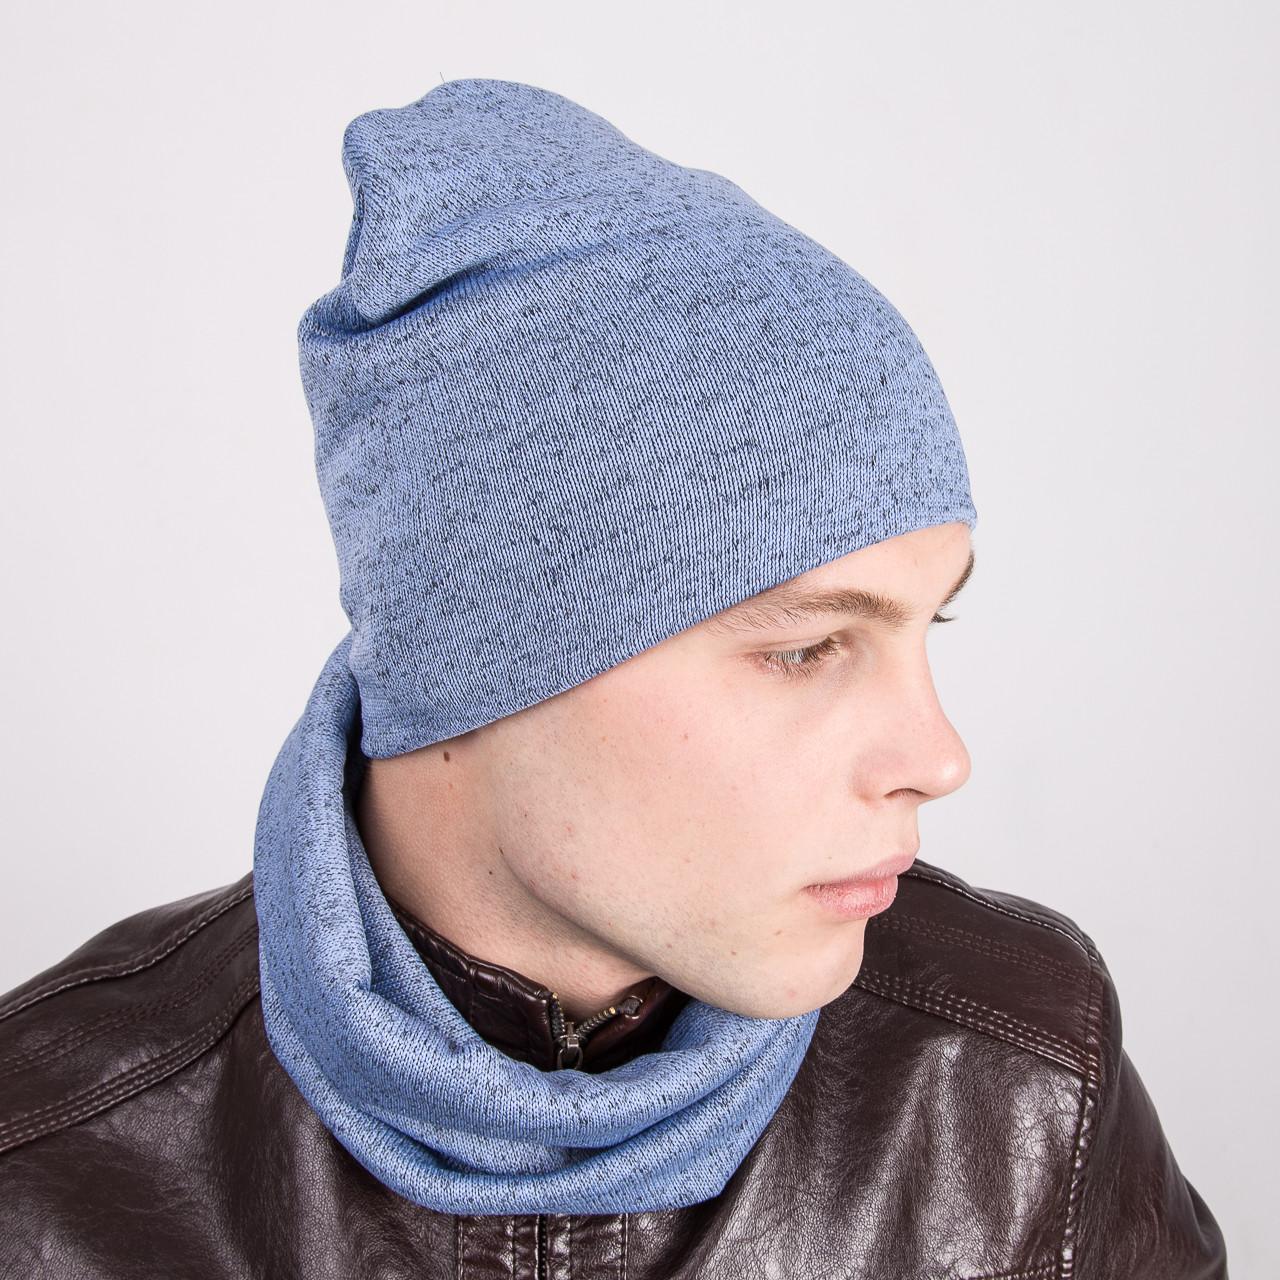 Зимний мужской комплект из шапки и хомута - Артикул k1b